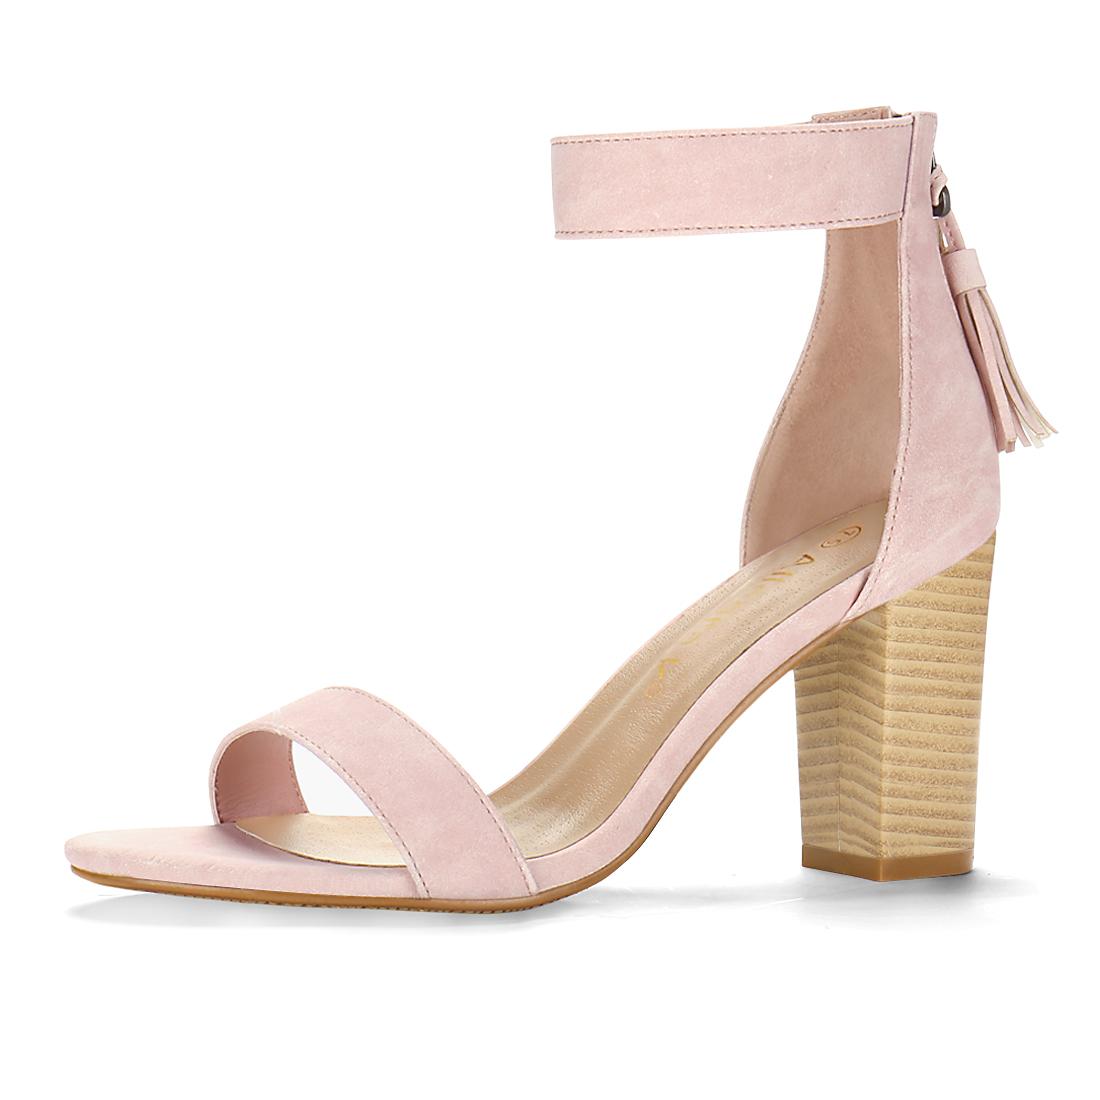 Women Open Toe Tassel Stacked Heel Ankle Strap Sandals Light Pink US 11